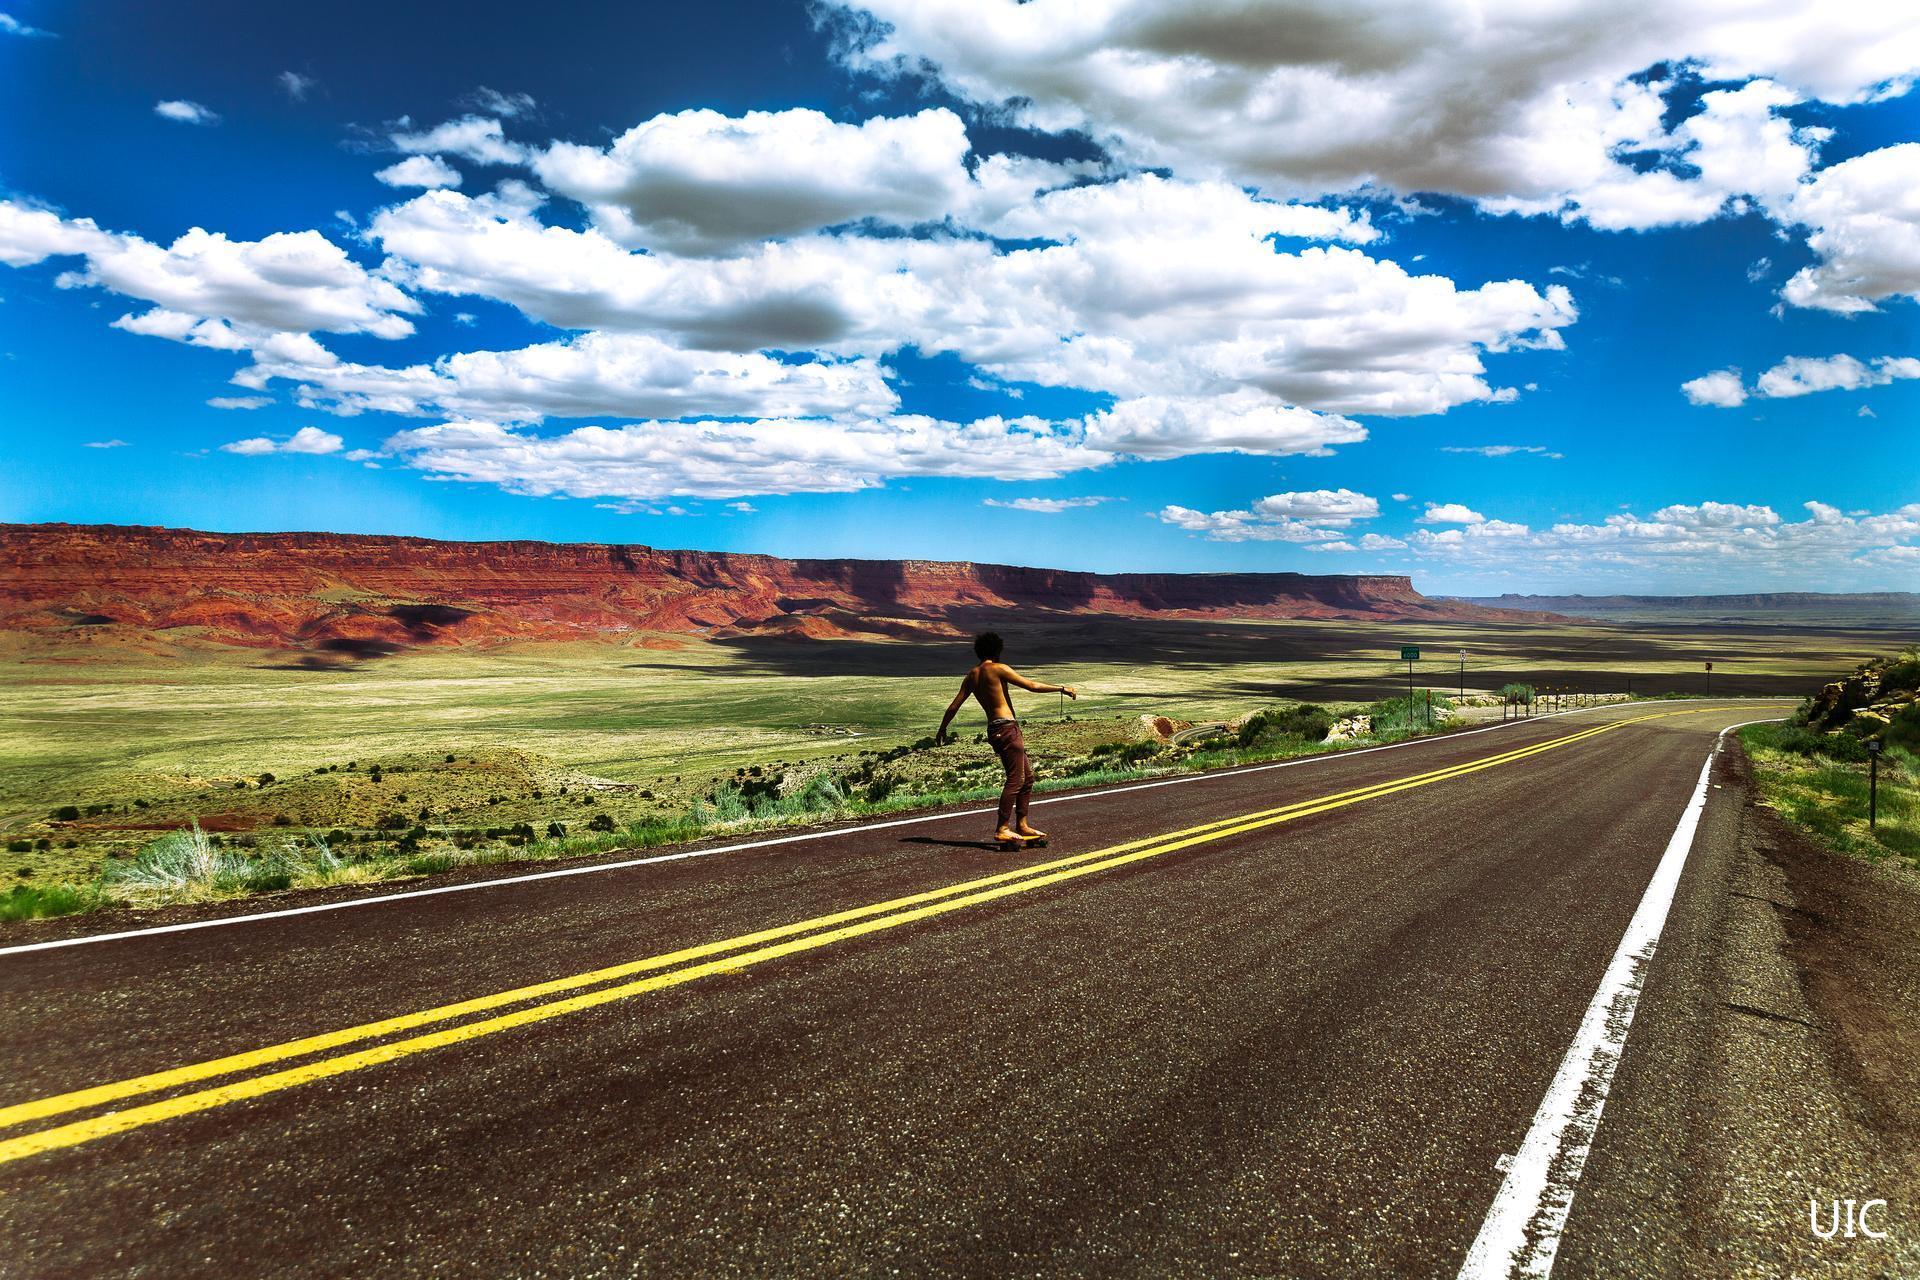 Life-of-Pix-free-stock-photos-arizona-skatboard-road-sidiomaralami.jpg